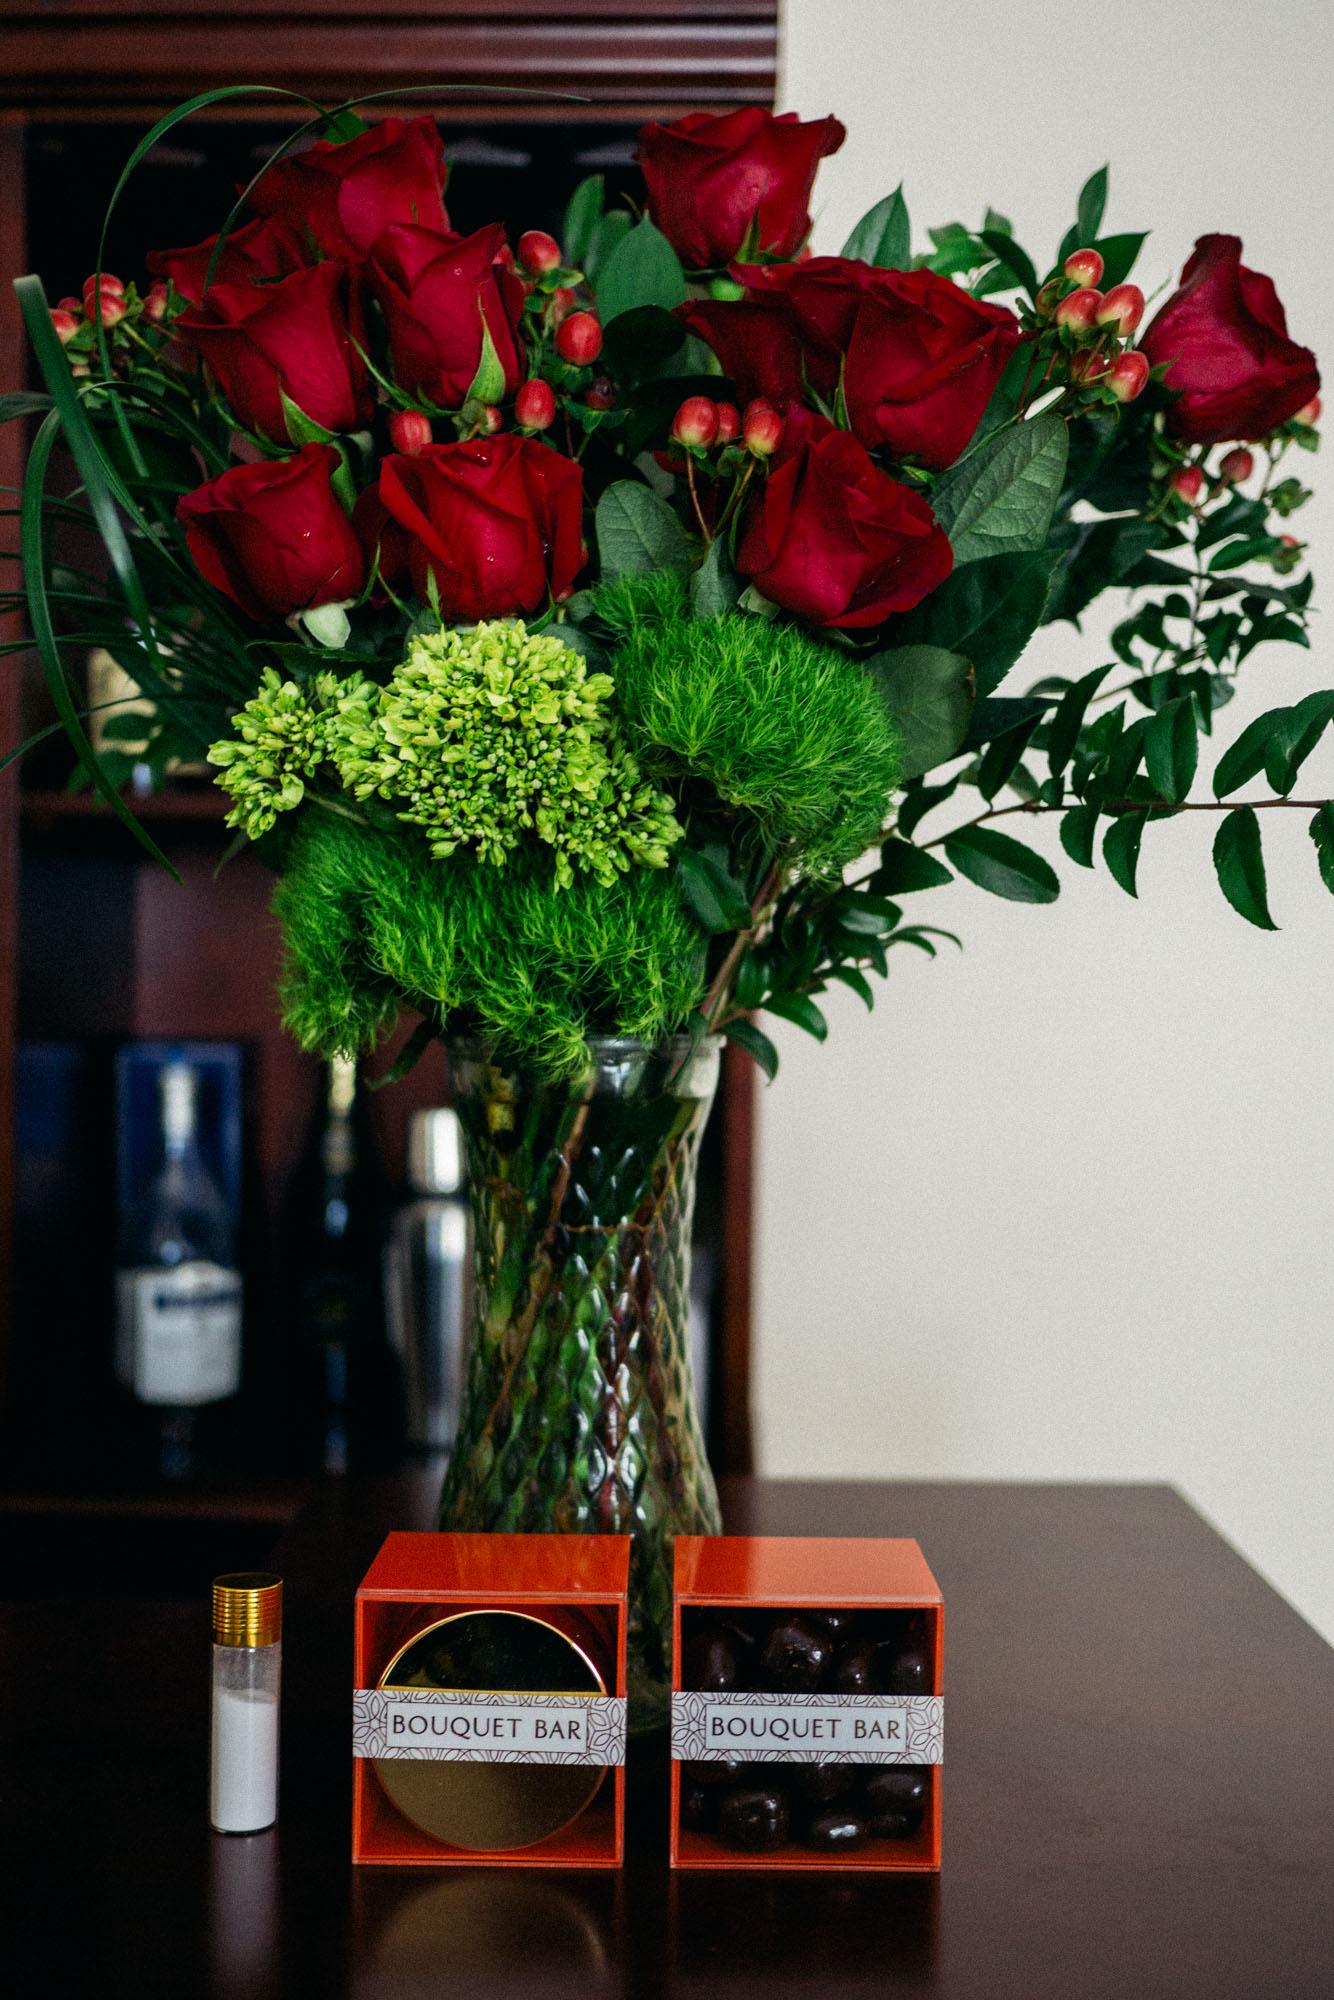 mybelonging-bouquet-bar-v-day-roses-gift-box-6.jpg